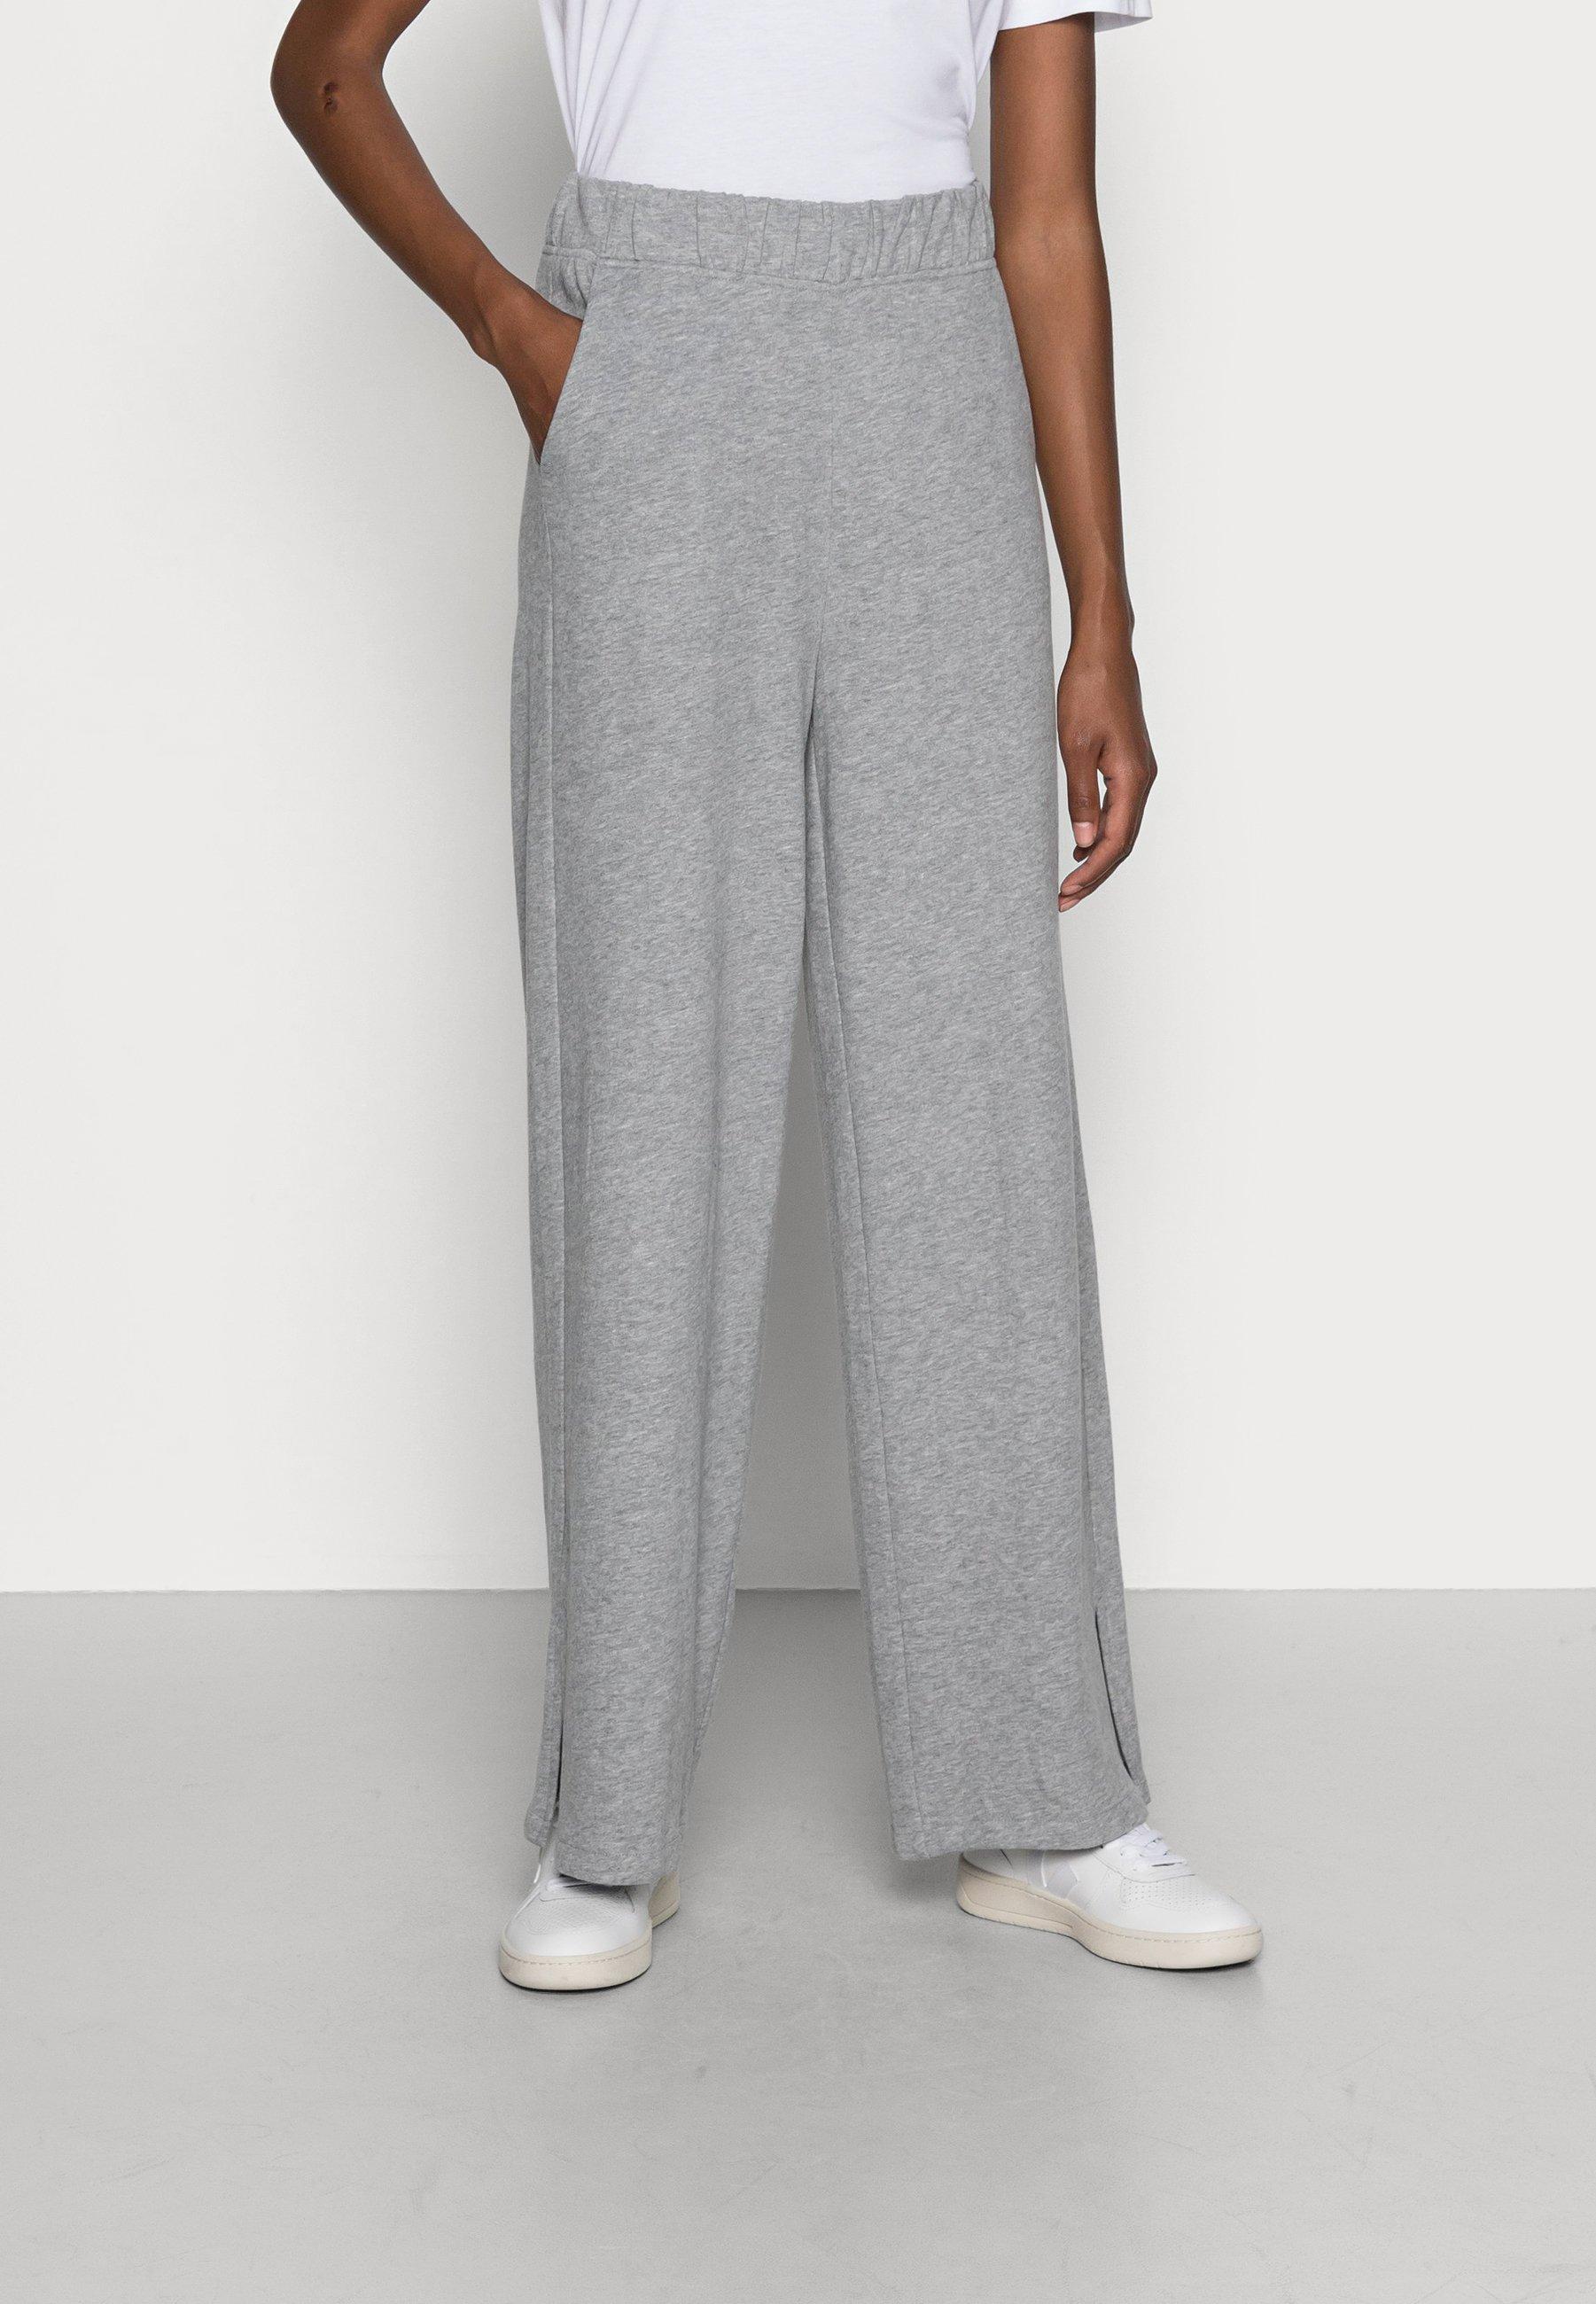 Mujer PANT - Pantalones deportivos - medium grey